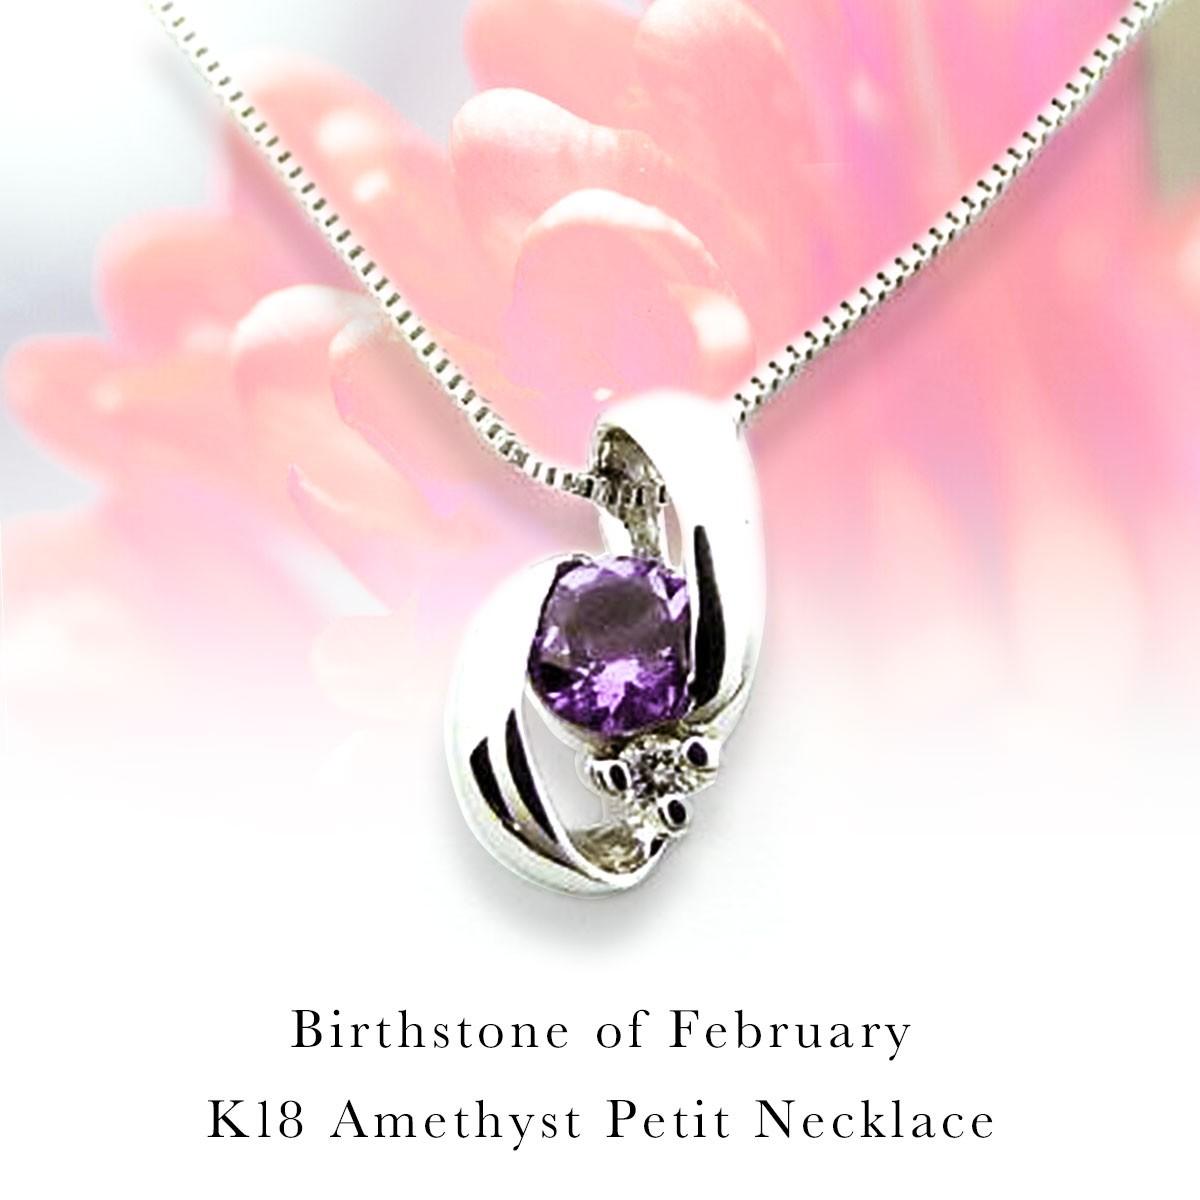 K18WG ネックレス アメジスト ダイヤモンド 2月誕生石 Birthstone ジュエリー アクセサリー レディース